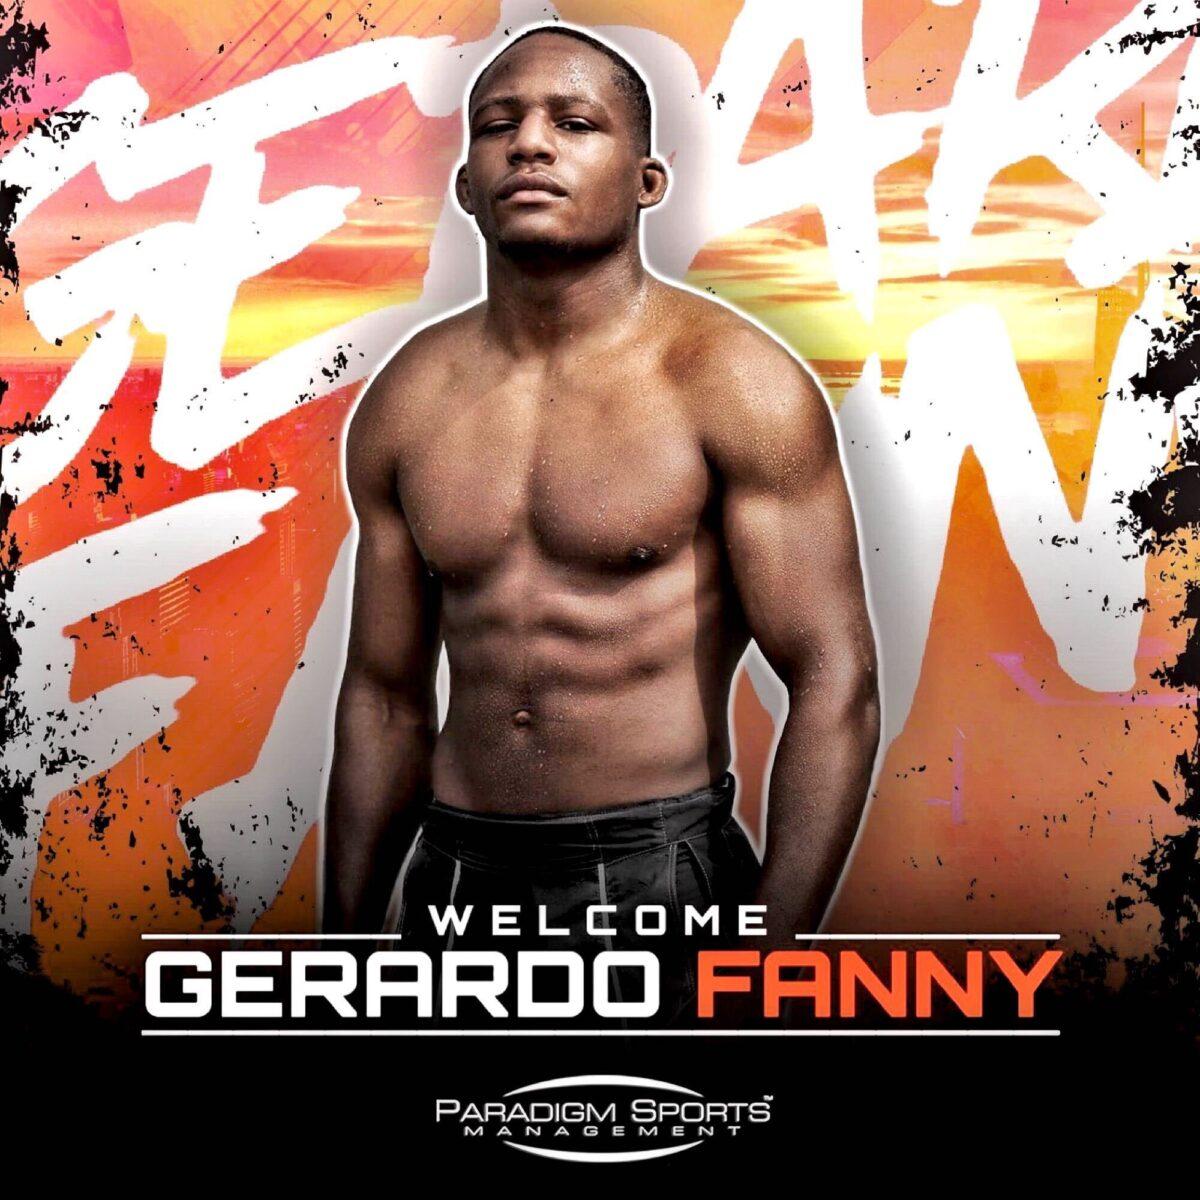 Gerardo Fanny